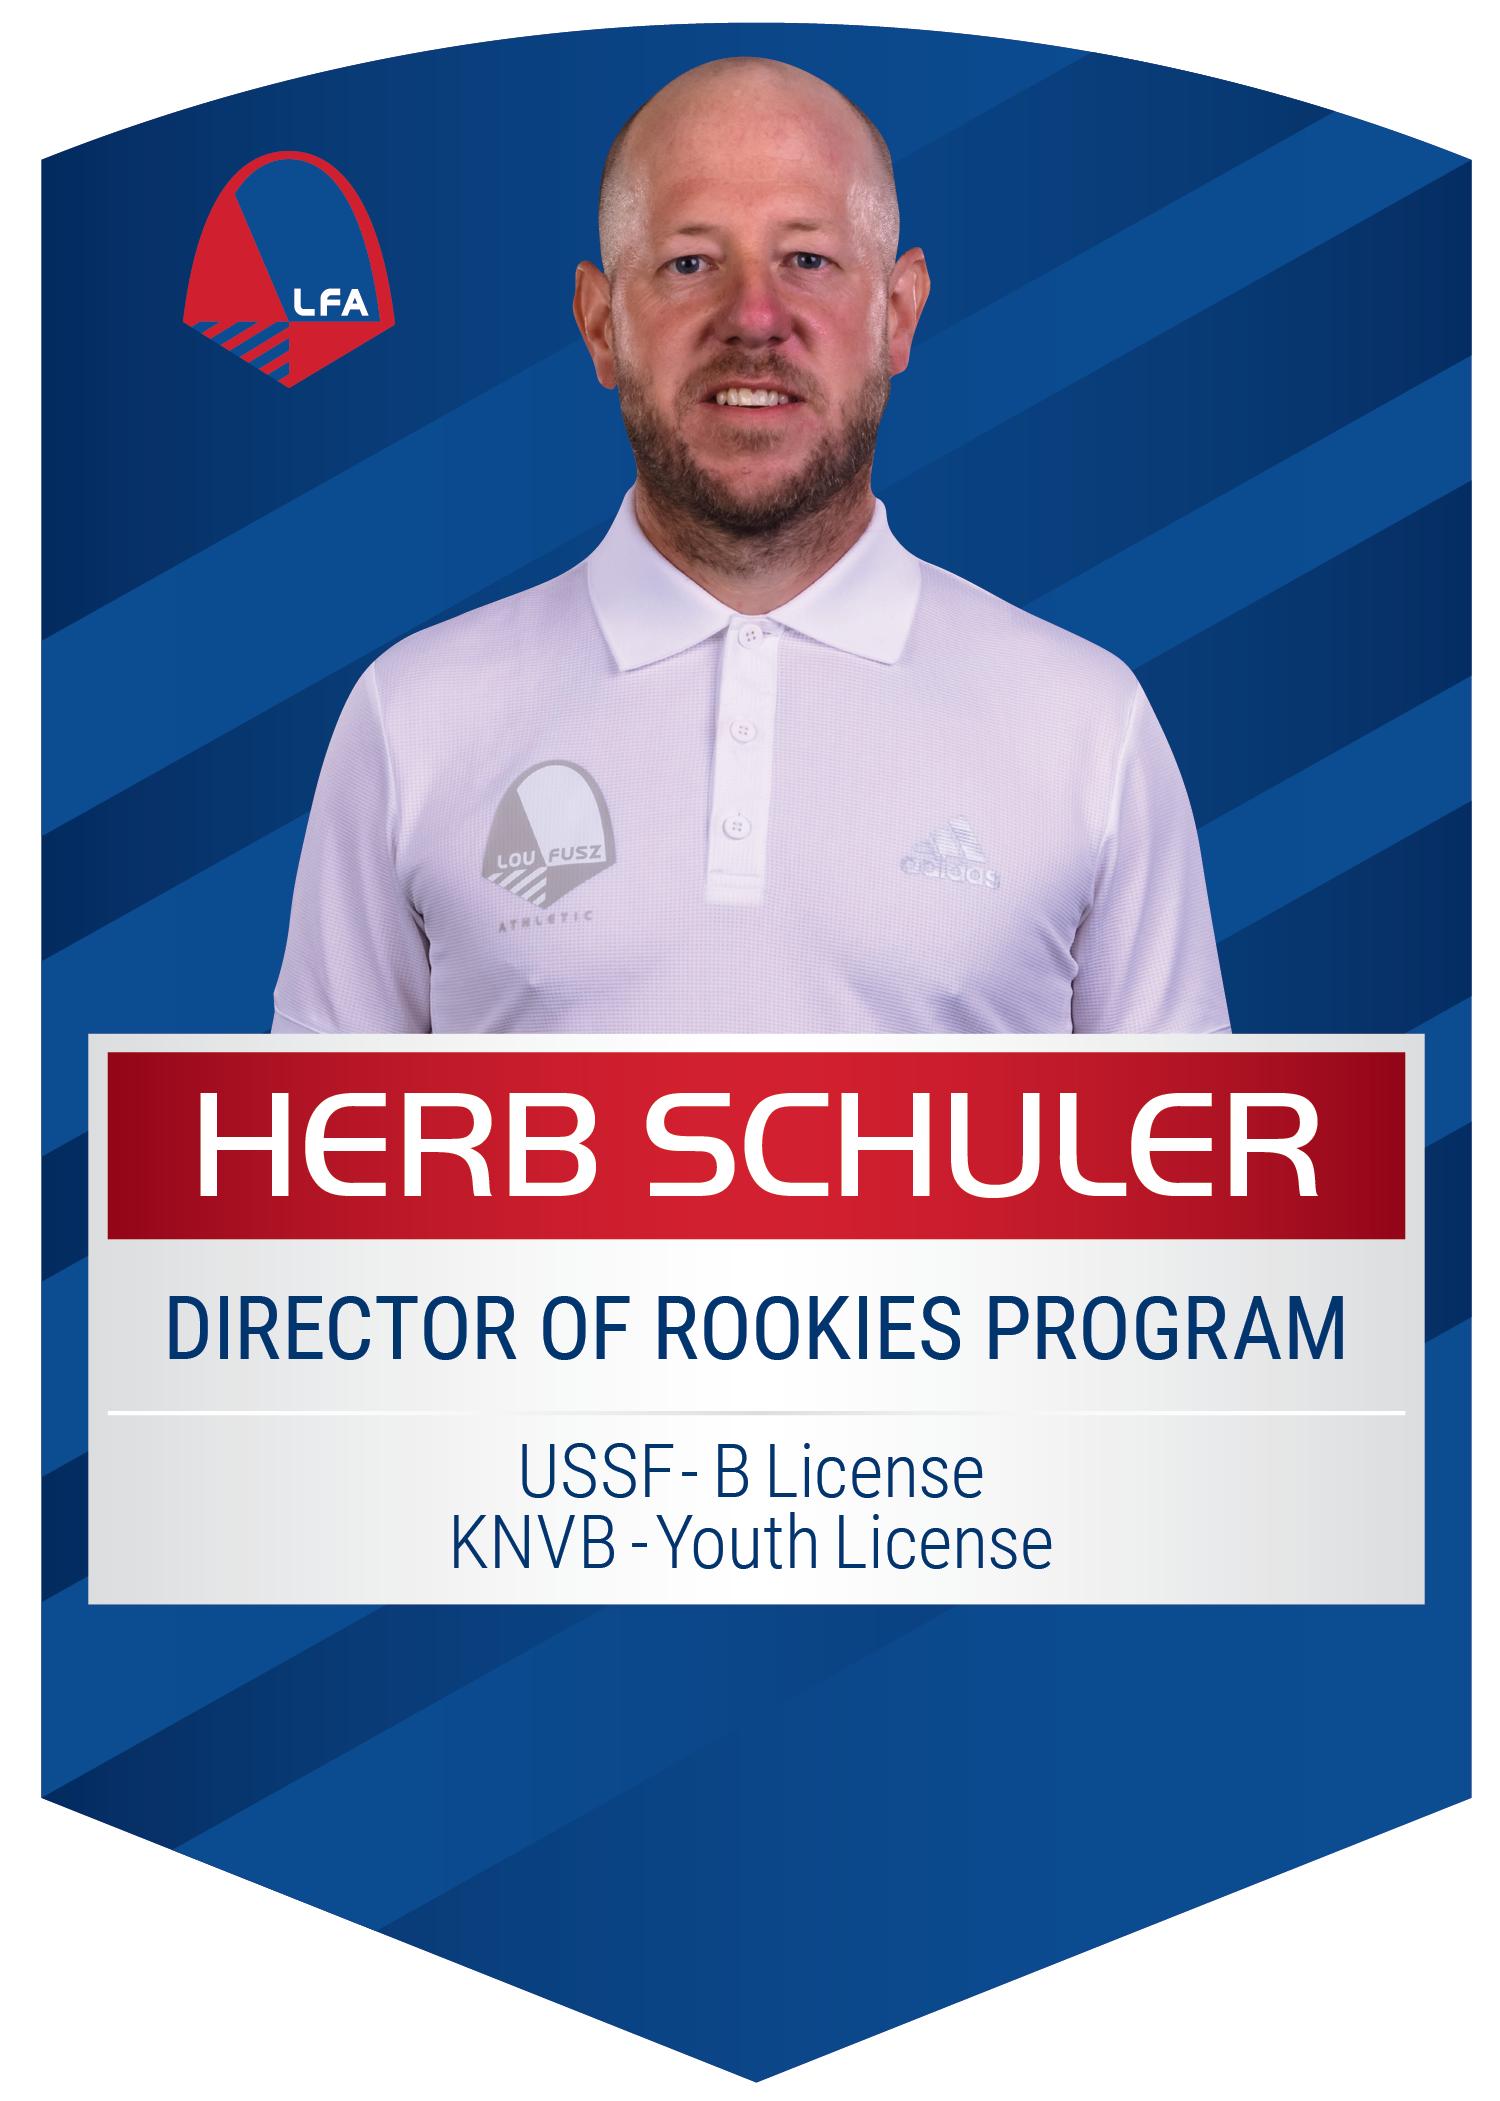 Herb Schuler